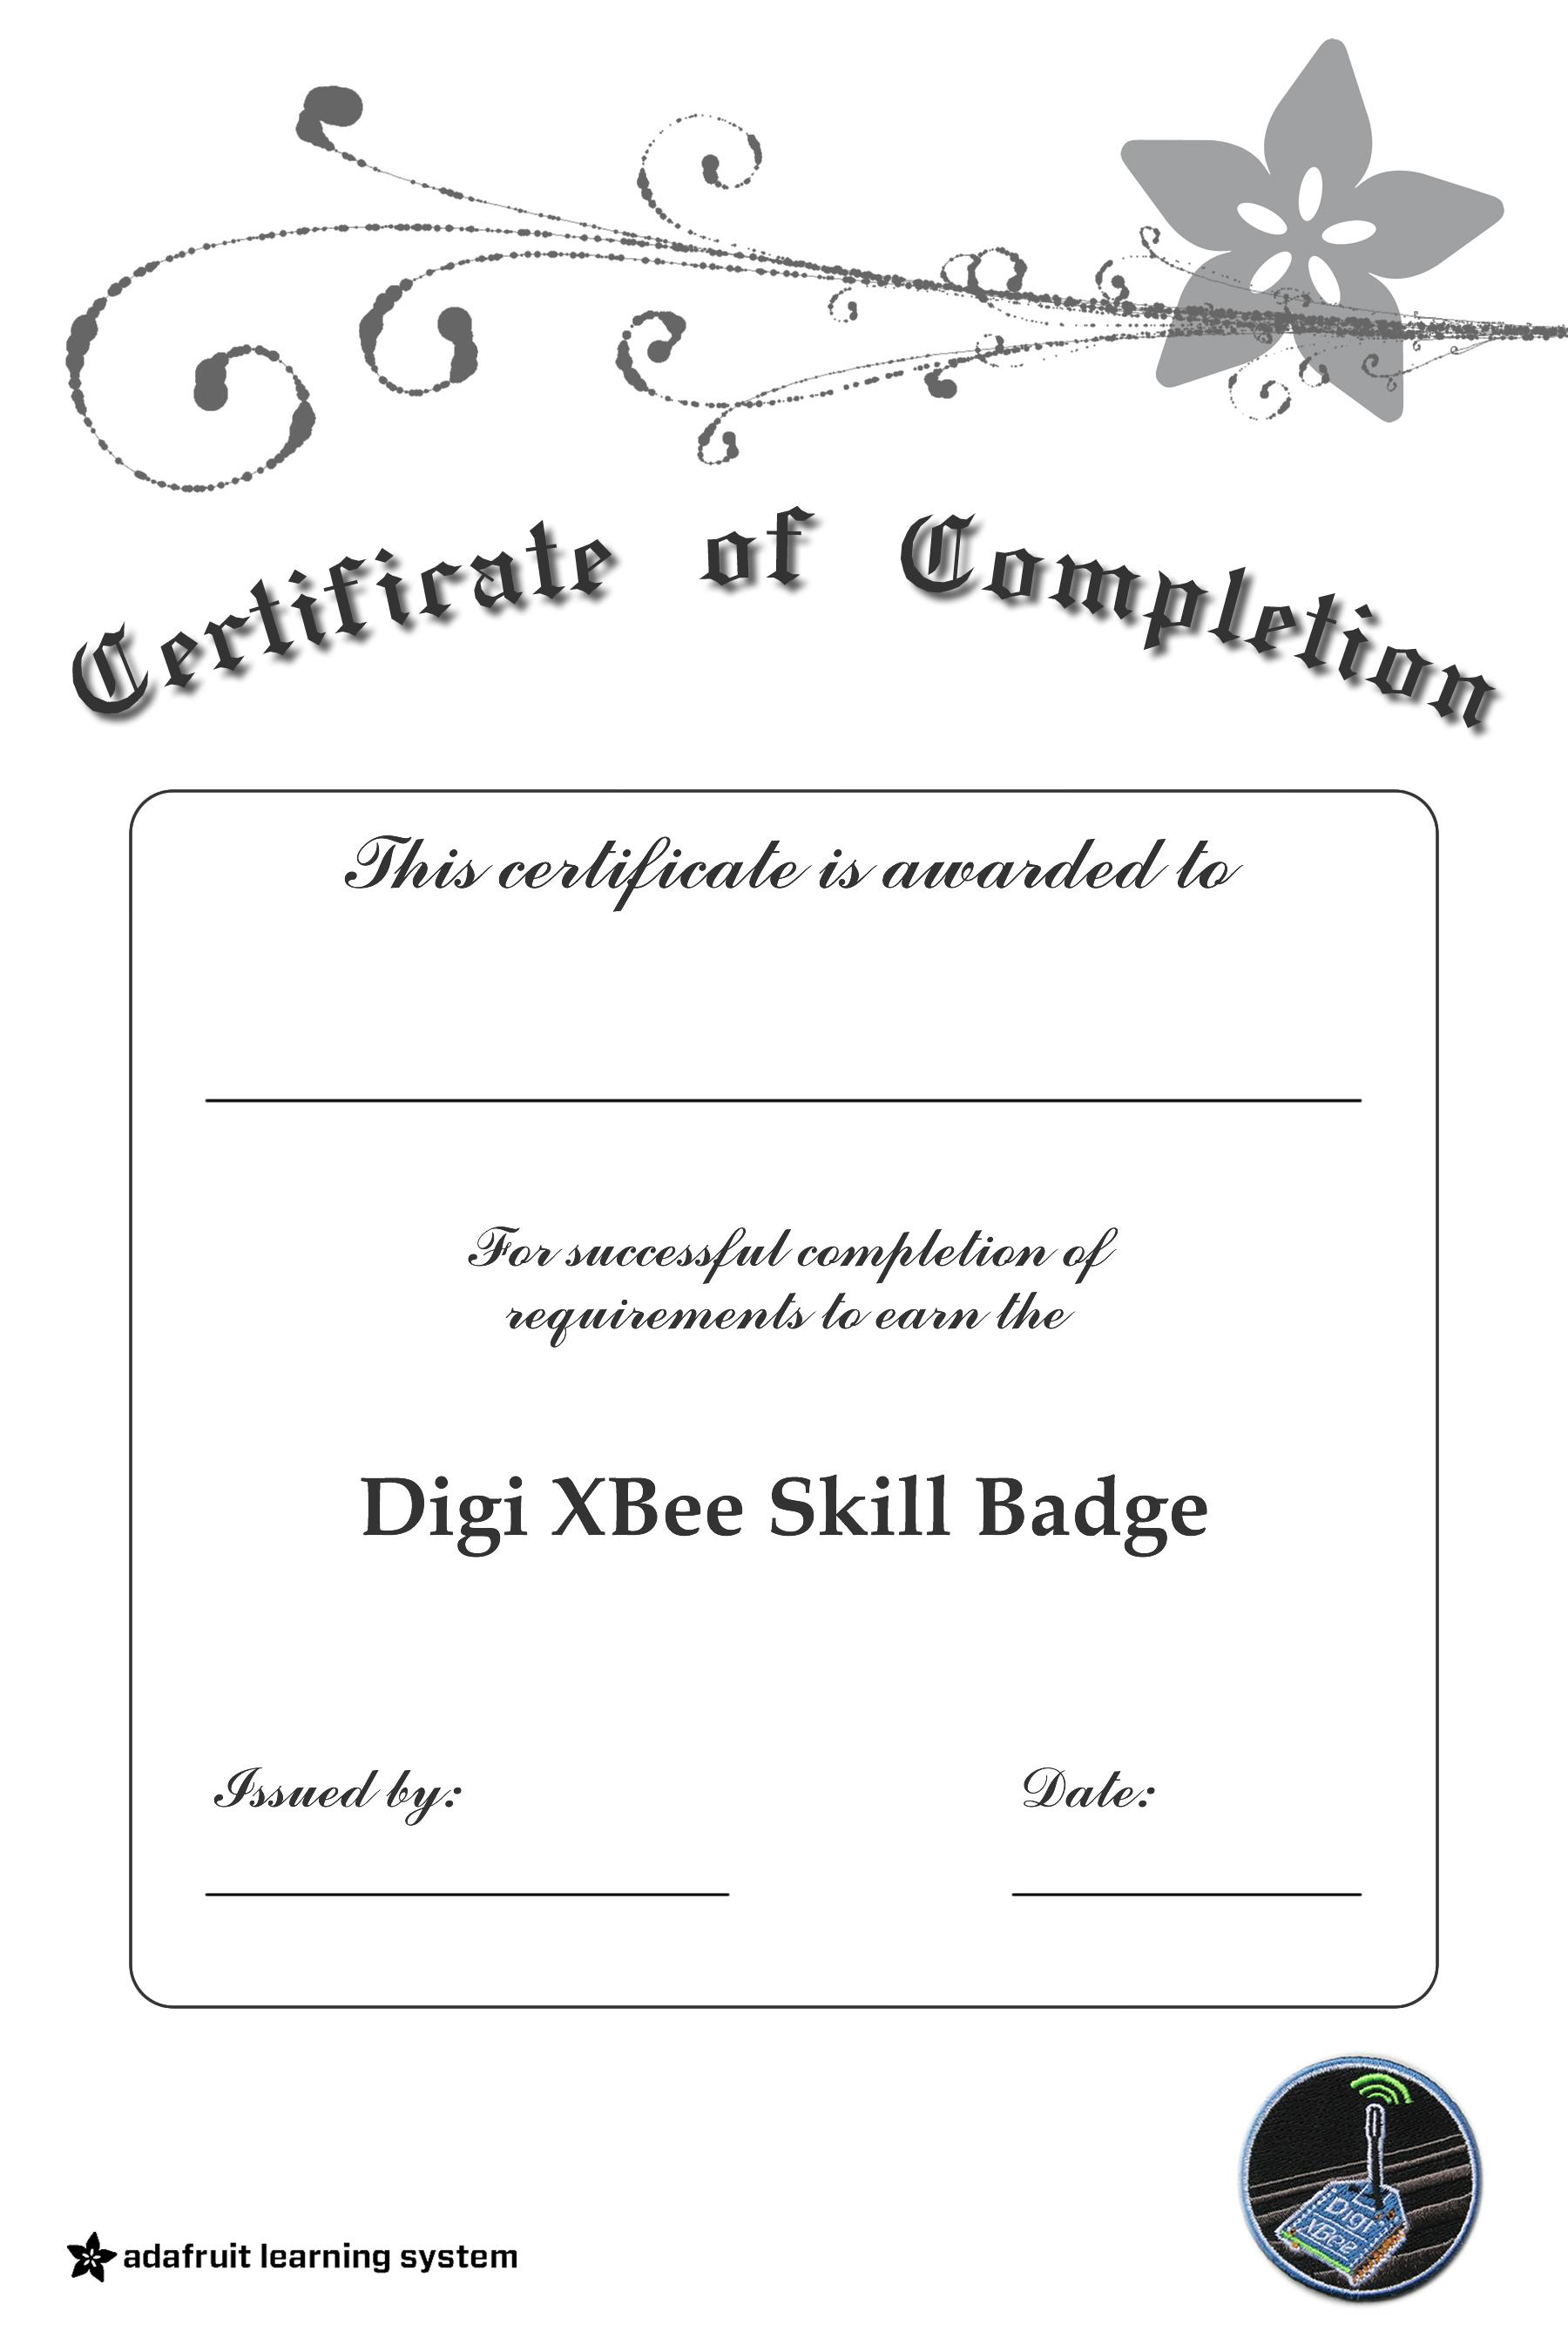 braincrafts_digi_xbee_-_certificate.png